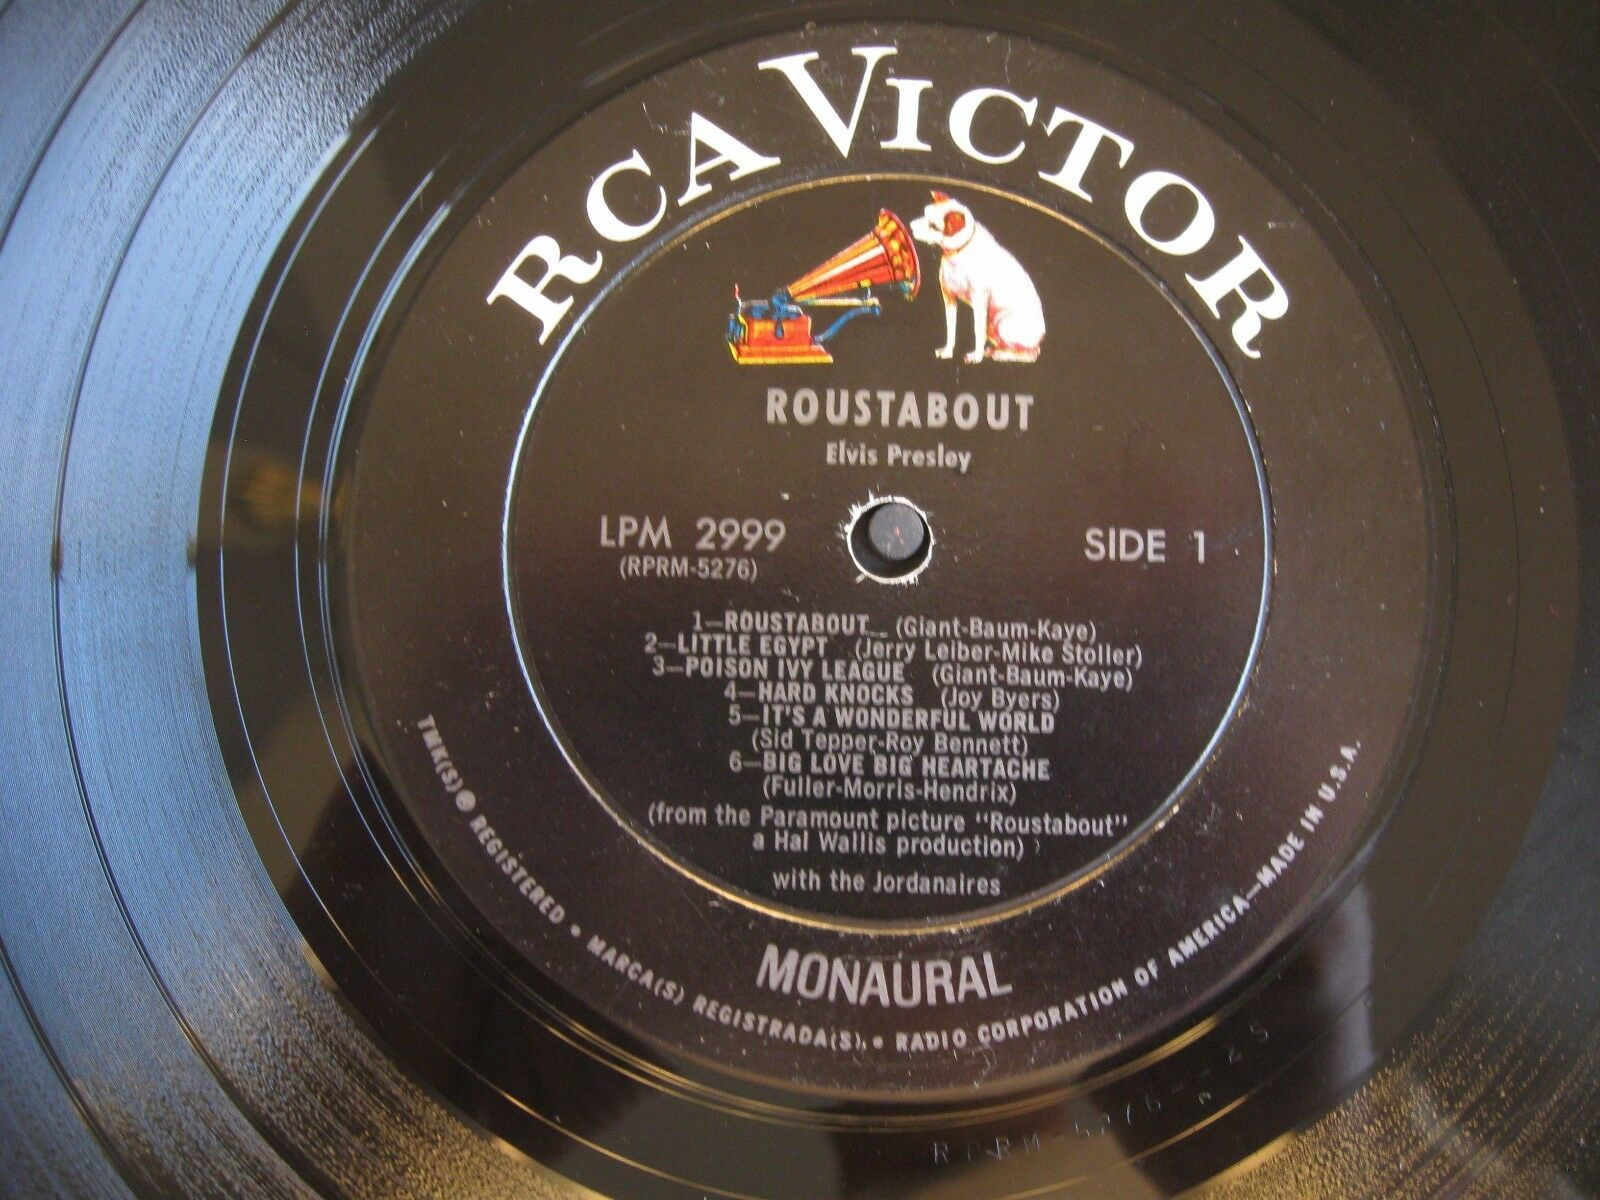 Elvis Presley Roustabout RCA LPM-2999 Mono Vinyl Record LP